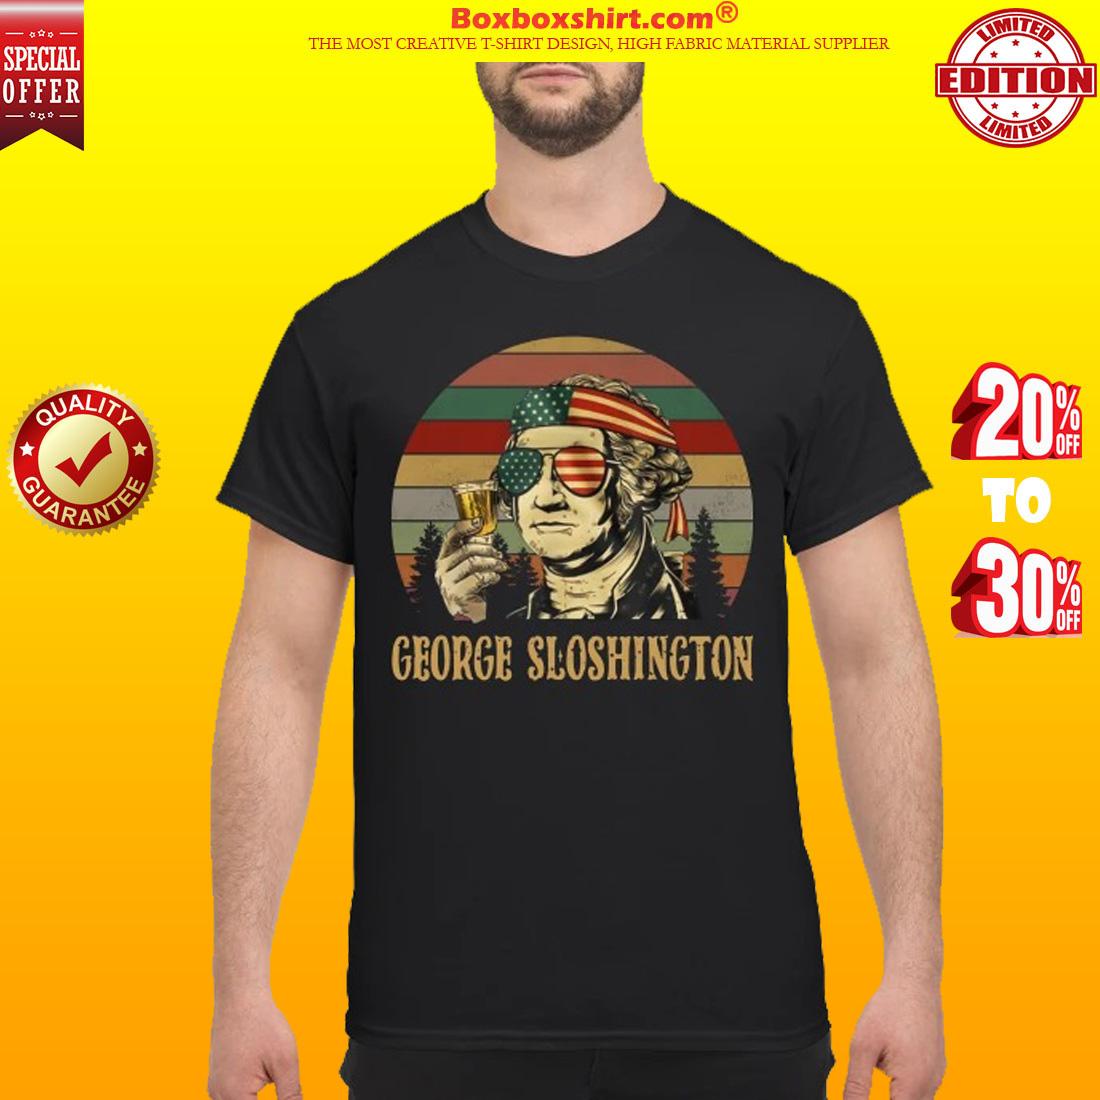 George sloshington classic shirt